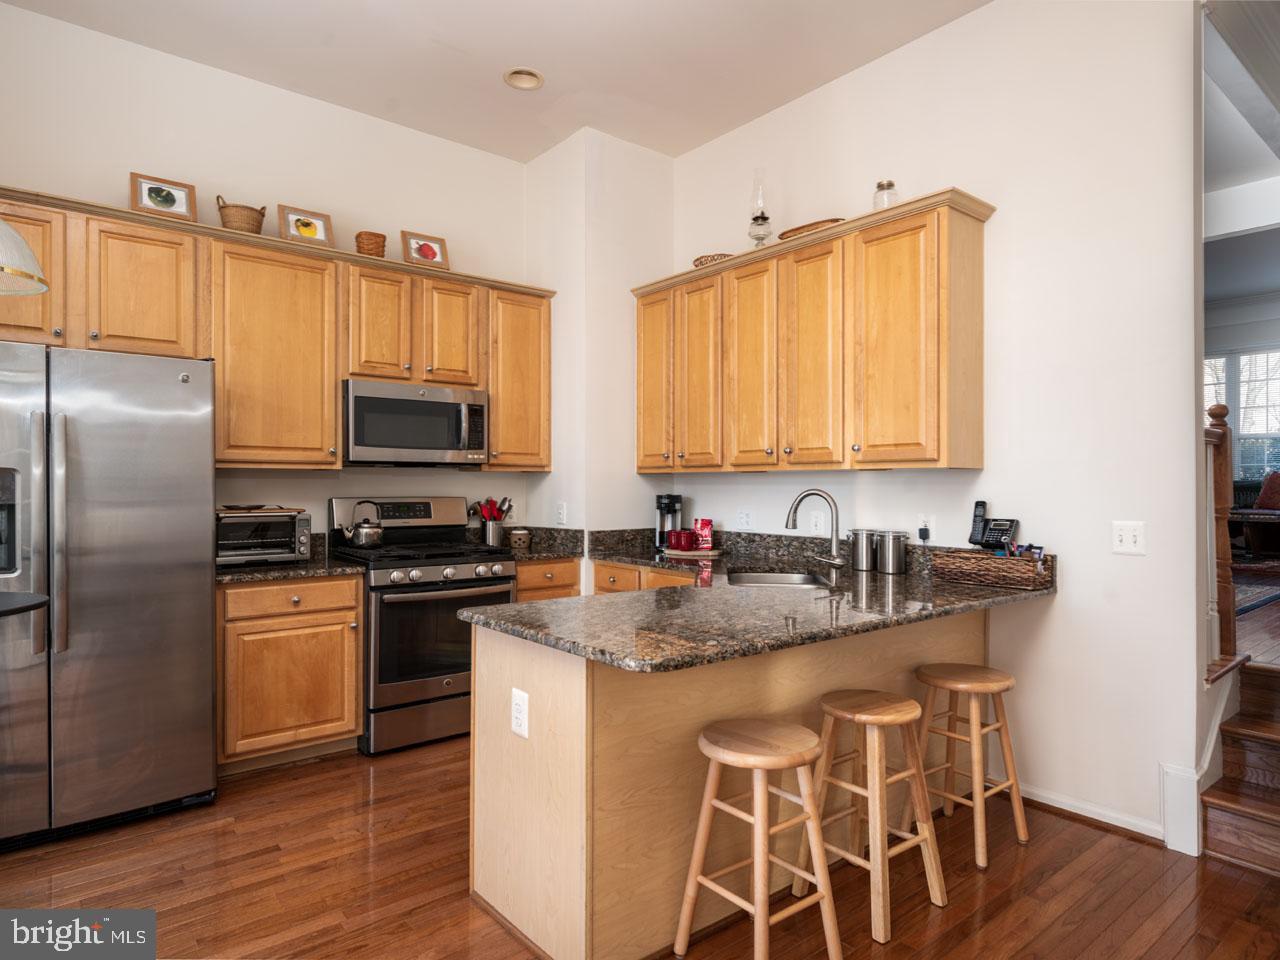 VAFX1104336-302201656747-2021-07-16-19-45-25  |   | Alexandria Delaware Real Estate For Sale | MLS# Vafx1104336  - Best of Northern Virginia